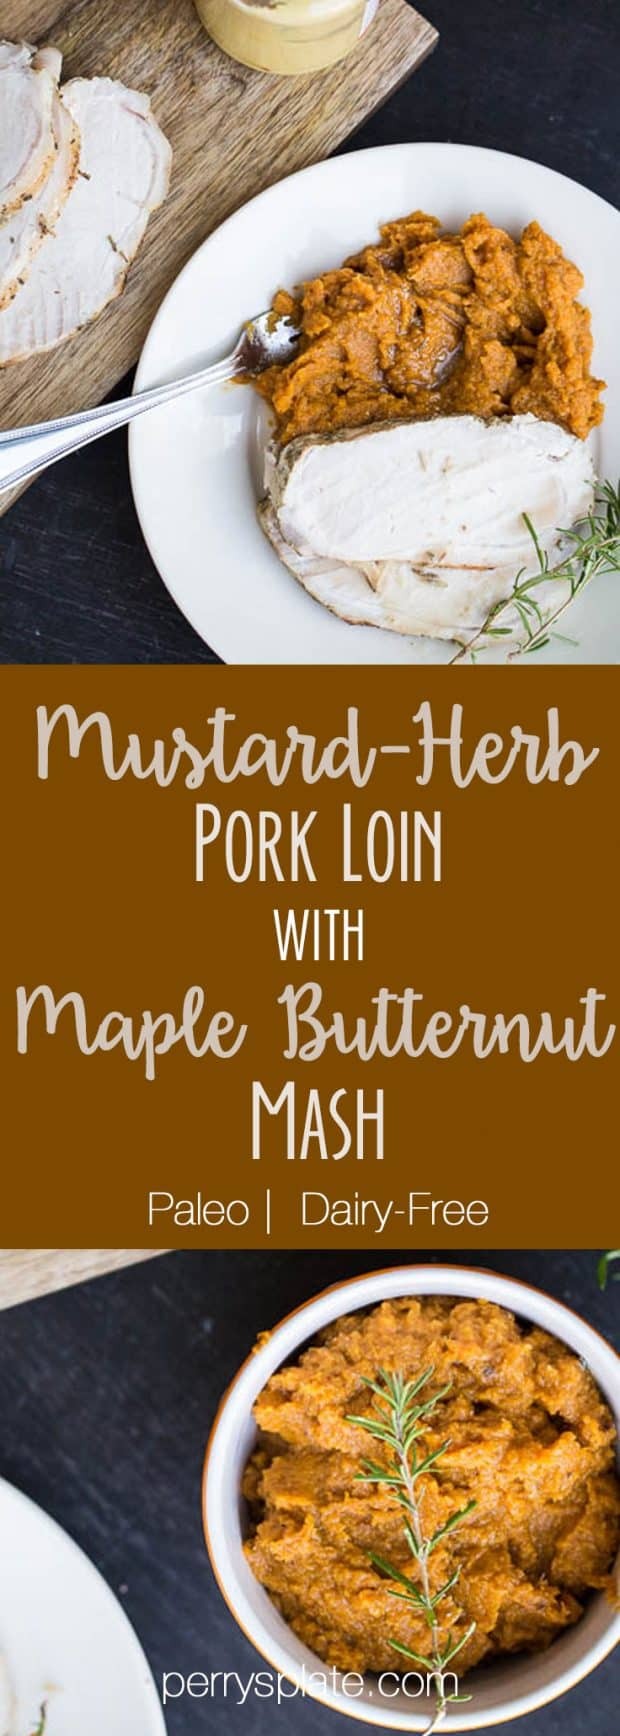 Mustard-Herb Pork Loin with Maple Butternut Mash   paleo recipes   pork recipes   butternut squash recipes   fall recipes   perrysplate.com